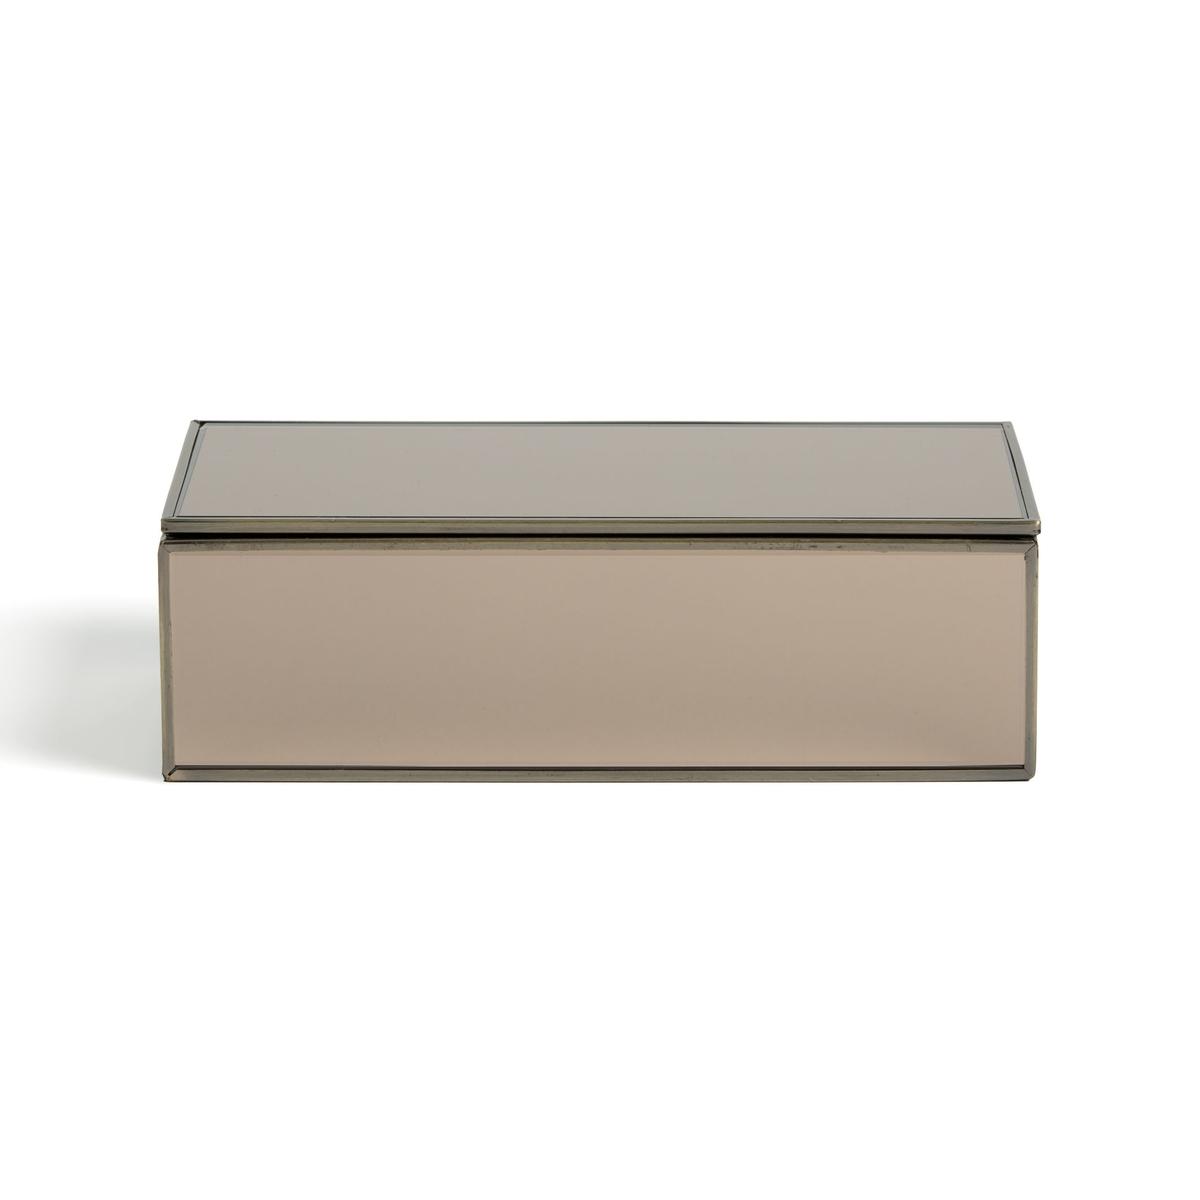 Коробка-витрина La Redoute С зеркалом Ш x В x Г см Digori единый размер бежевый костюм санты с бантиком 42 44